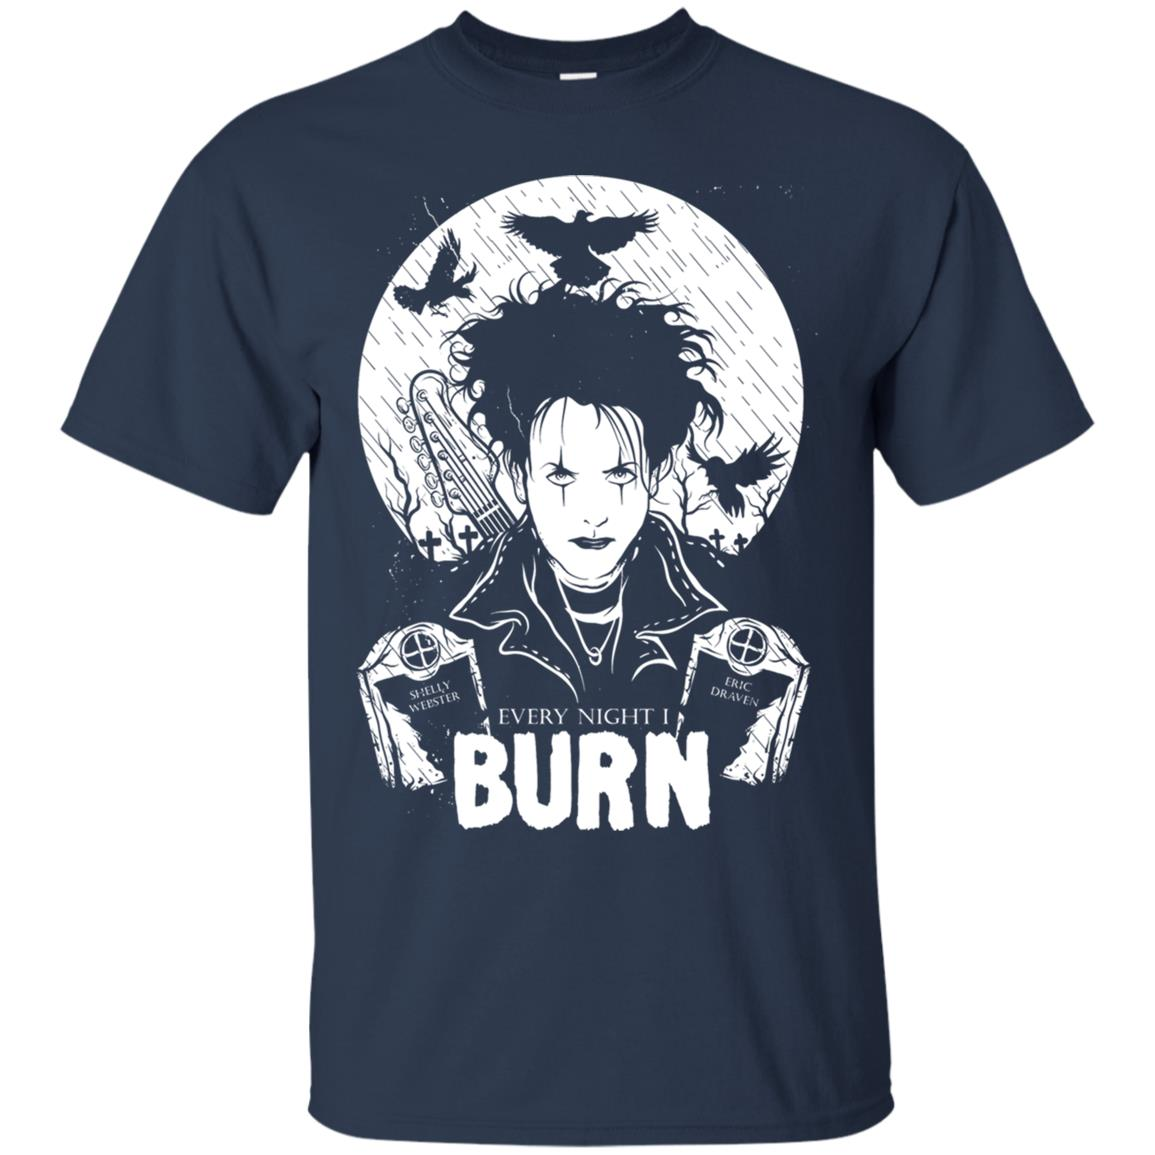 7fbdec6ed Robert Smith Every night I burn shirt, hoodie, long sleeve